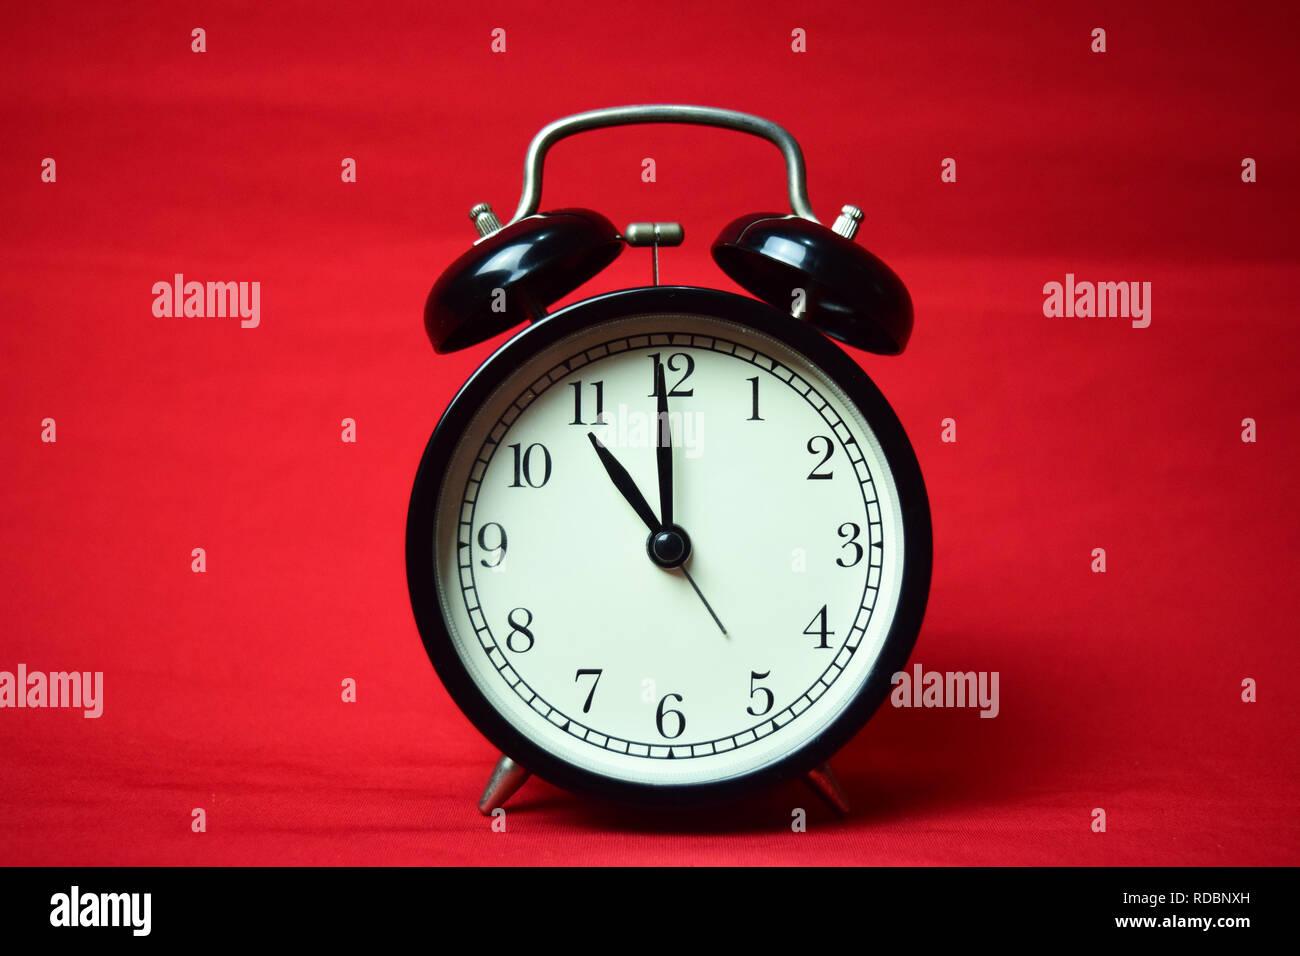 11 o'clock,am,pm,arrow,axis,background,business,chronometer,circle,circular,clock,clockface,clockwise,clockwork,closeup,concept,countdown,detail,eleve - Stock Image